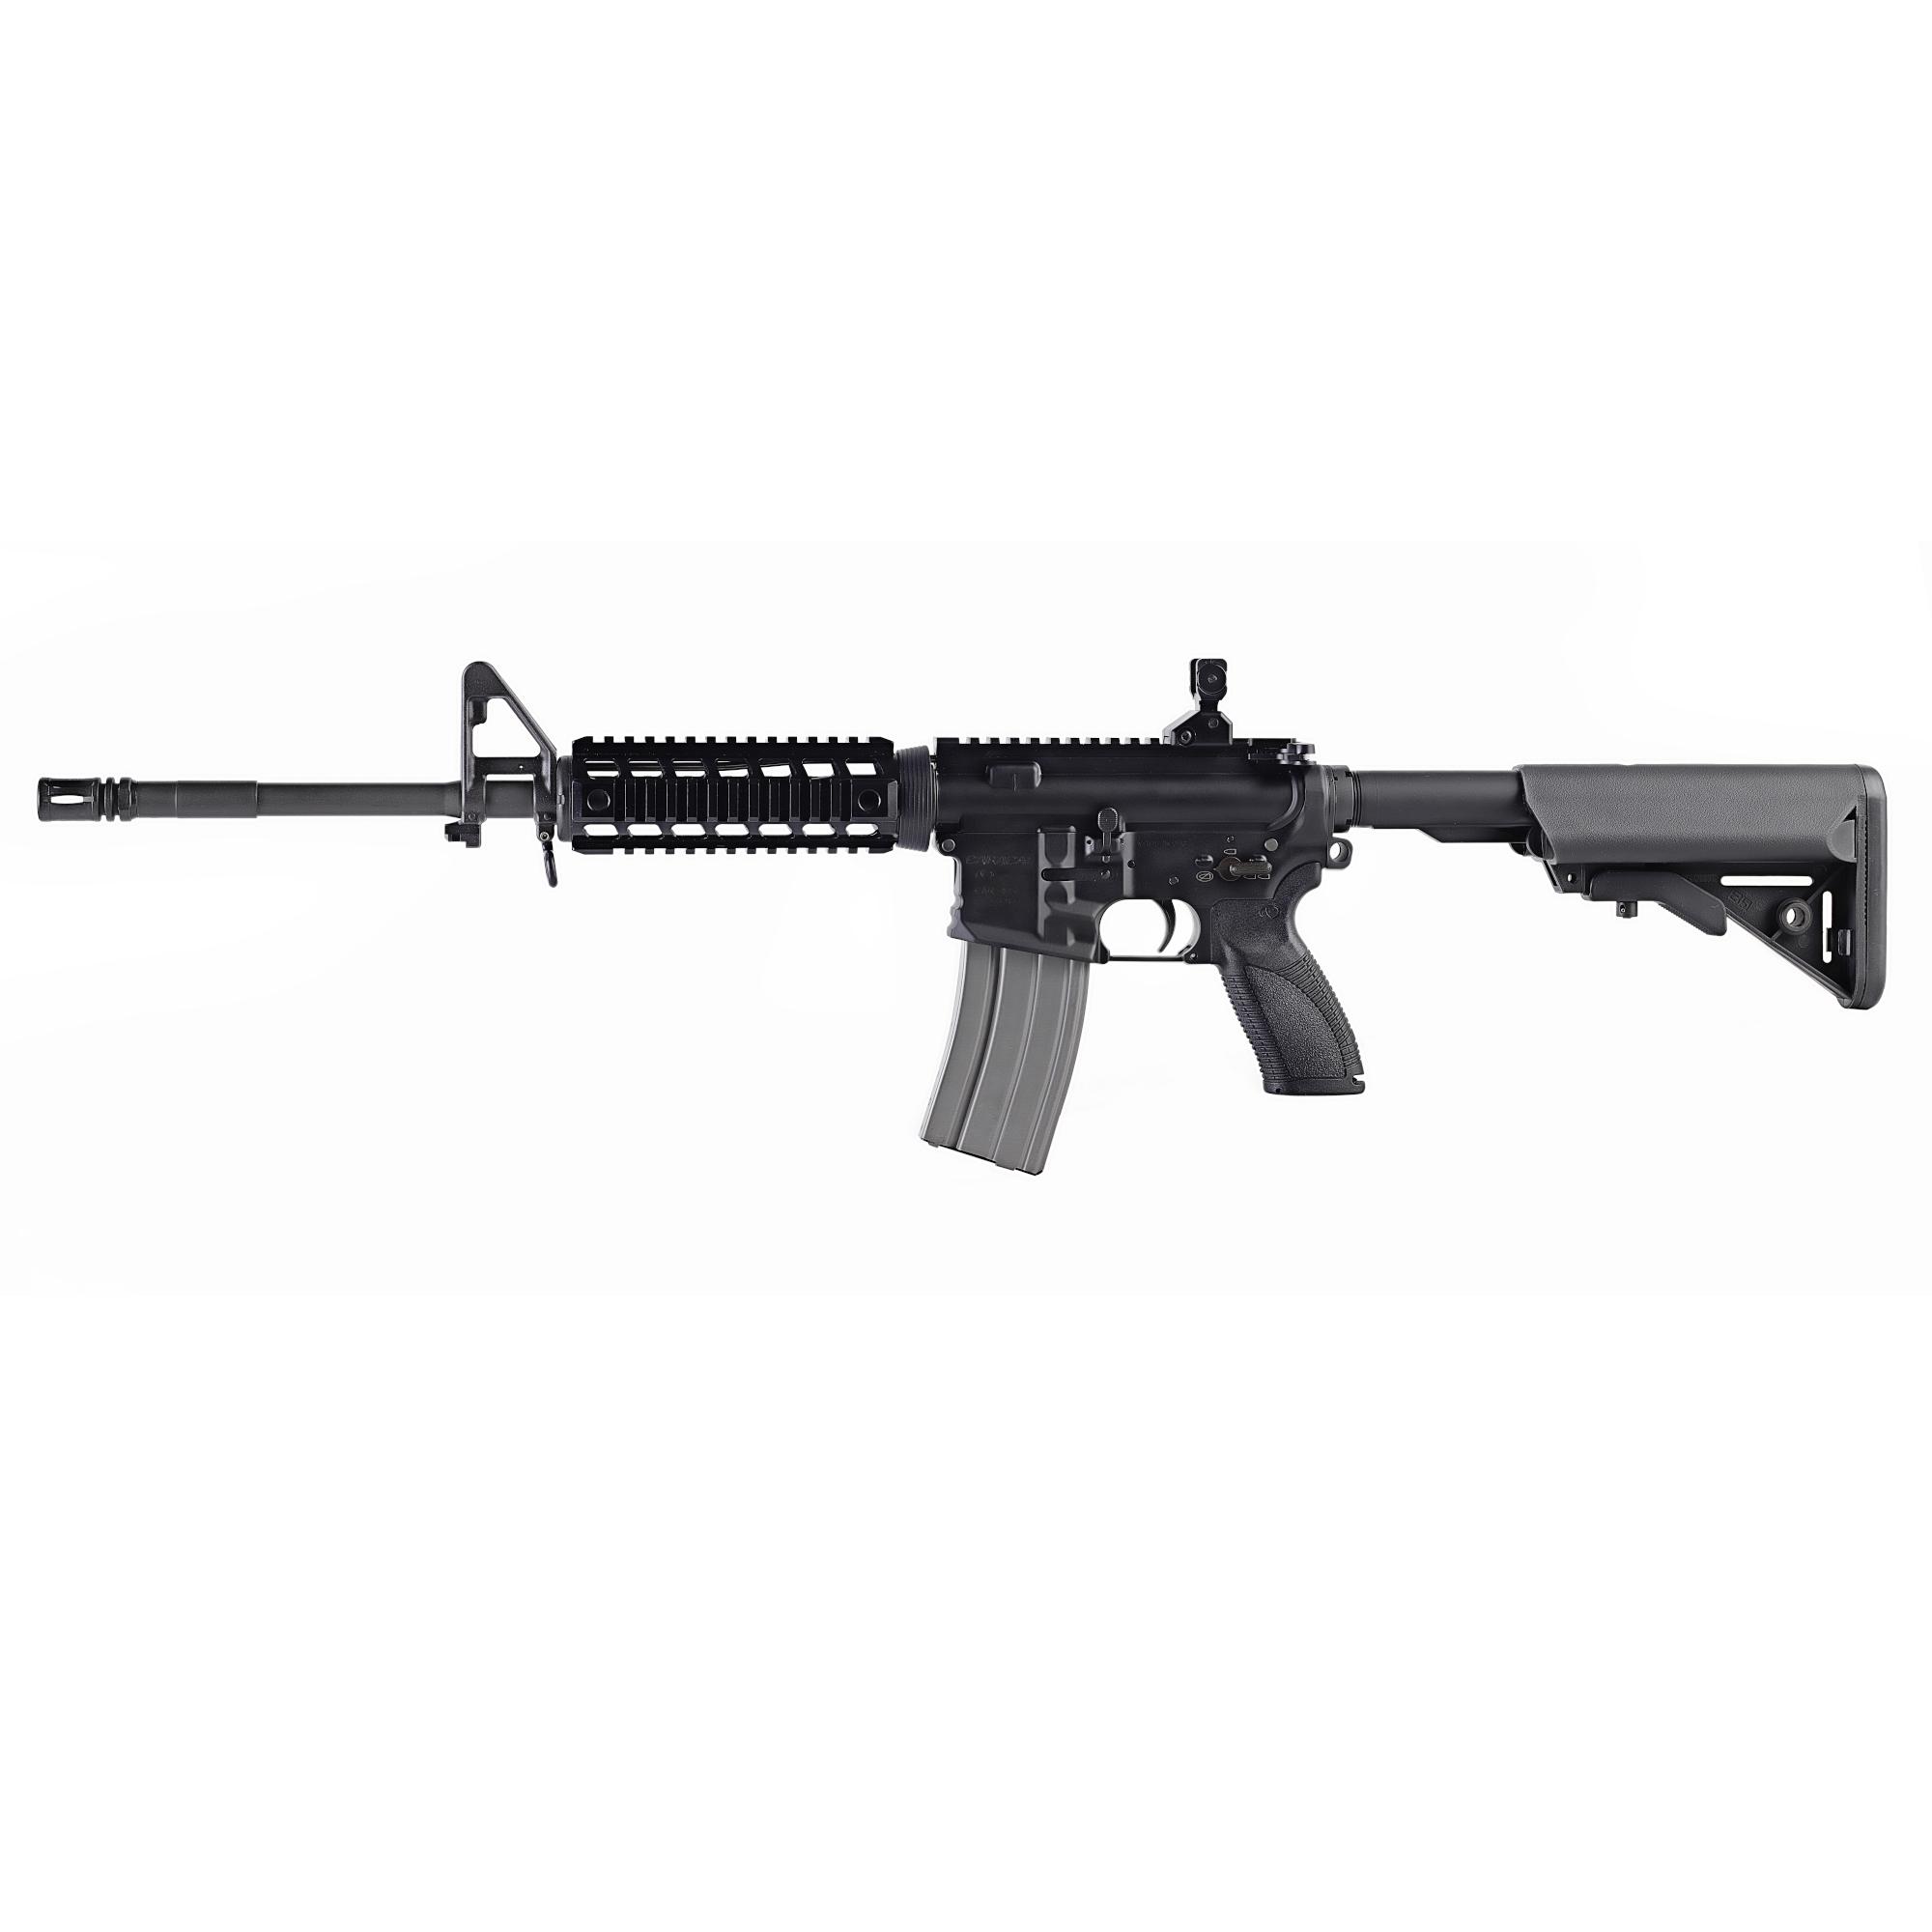 Carbine 14.5